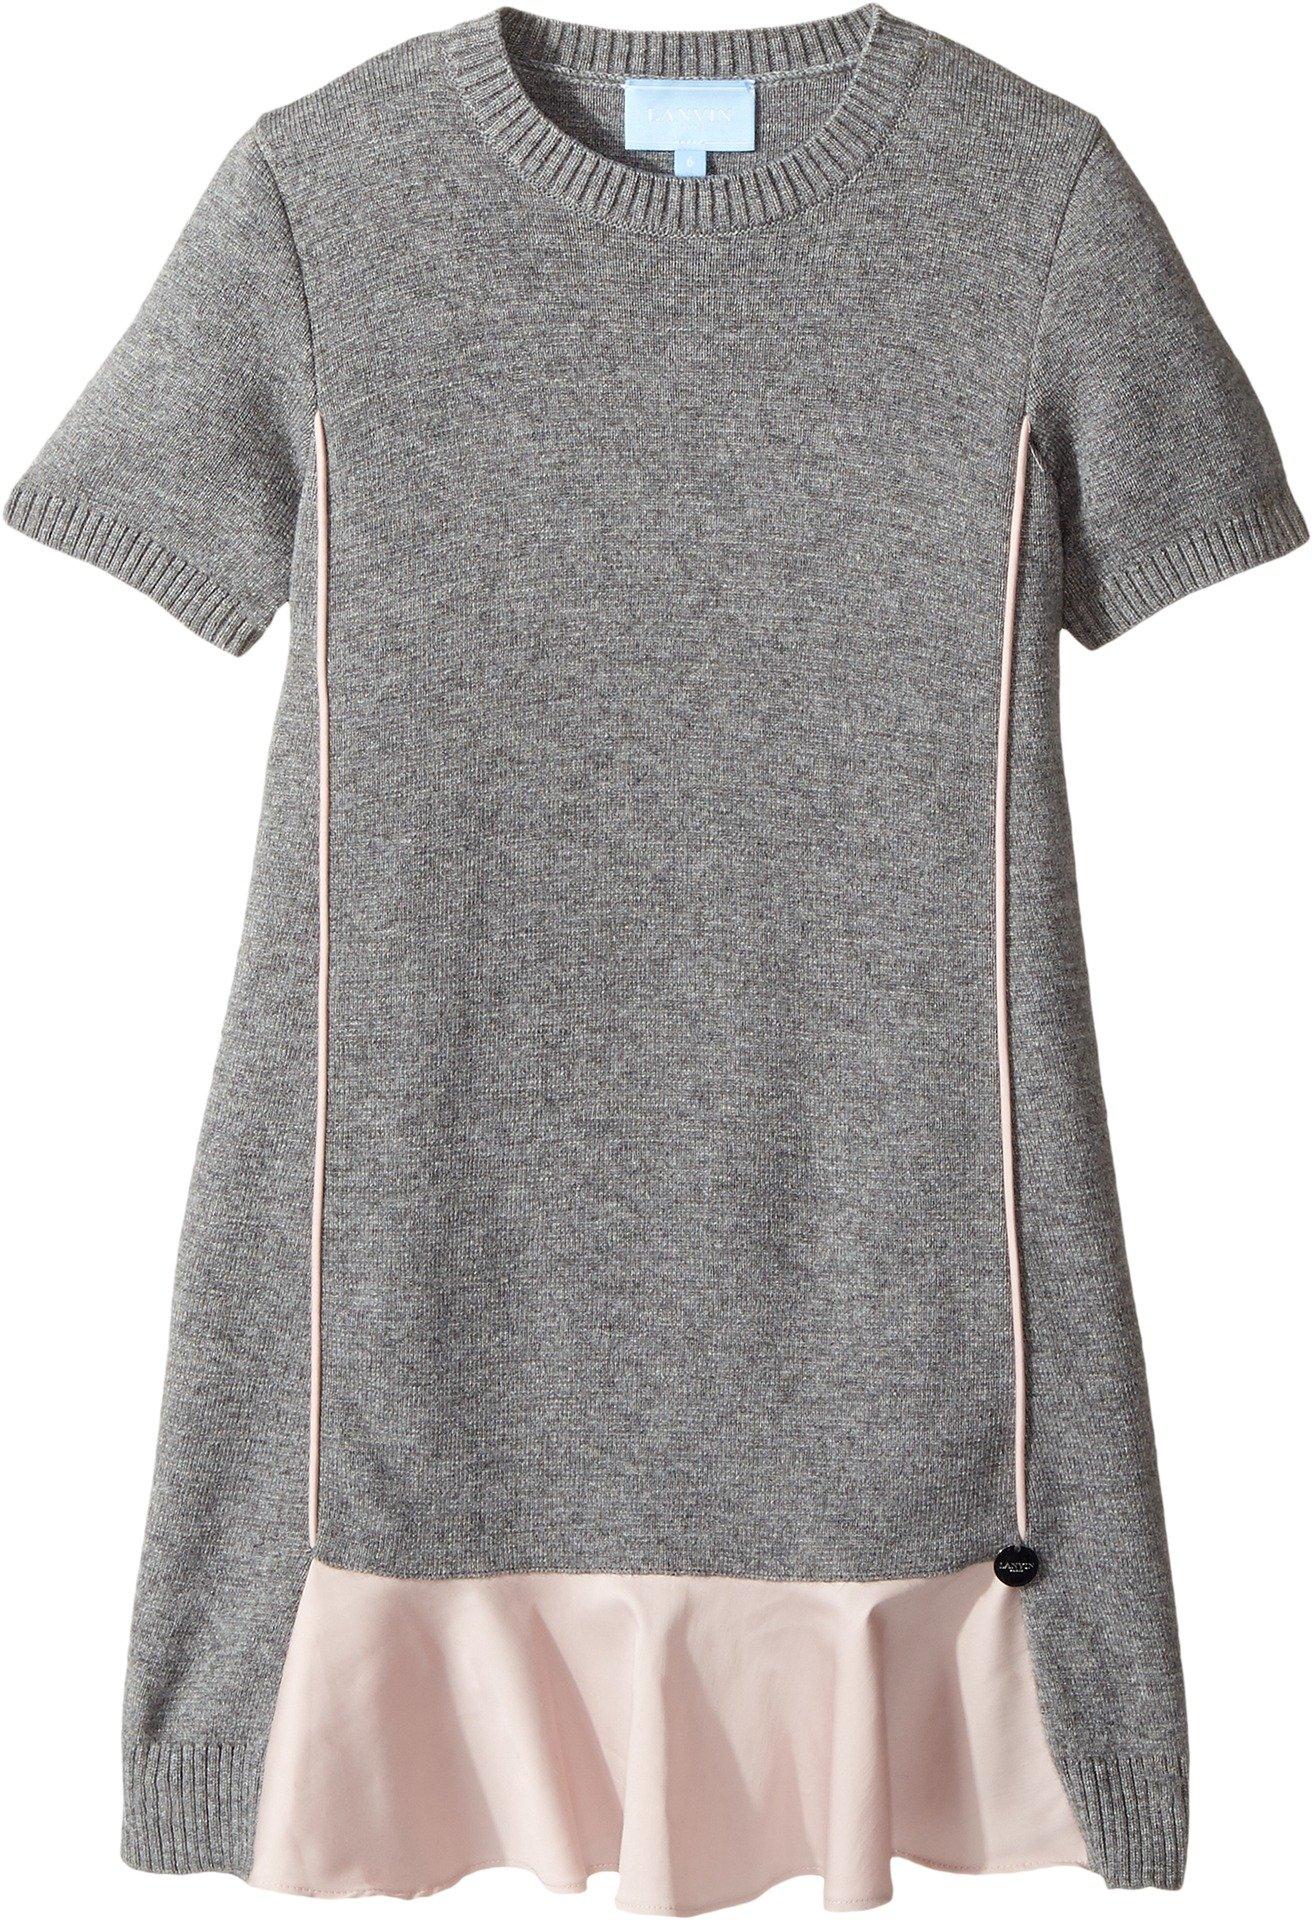 Lanvin Kids Girl's Short Sleeve Knit Dress with Contrast Ruffles On Front (Little Kids/Big Kids) Grey/Pink 8